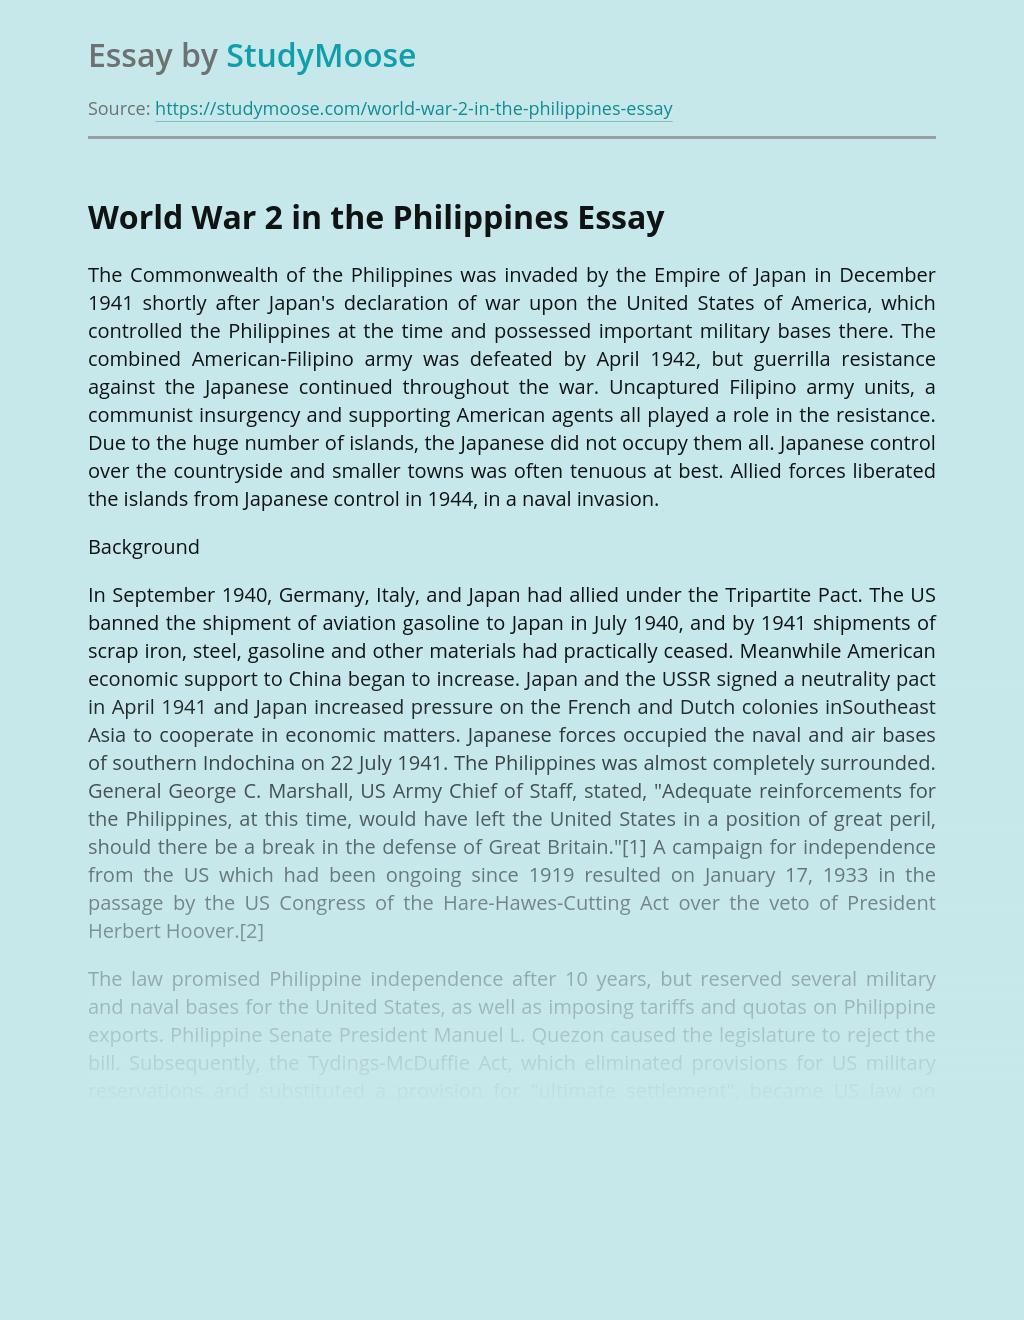 World War 2 in the Philippines